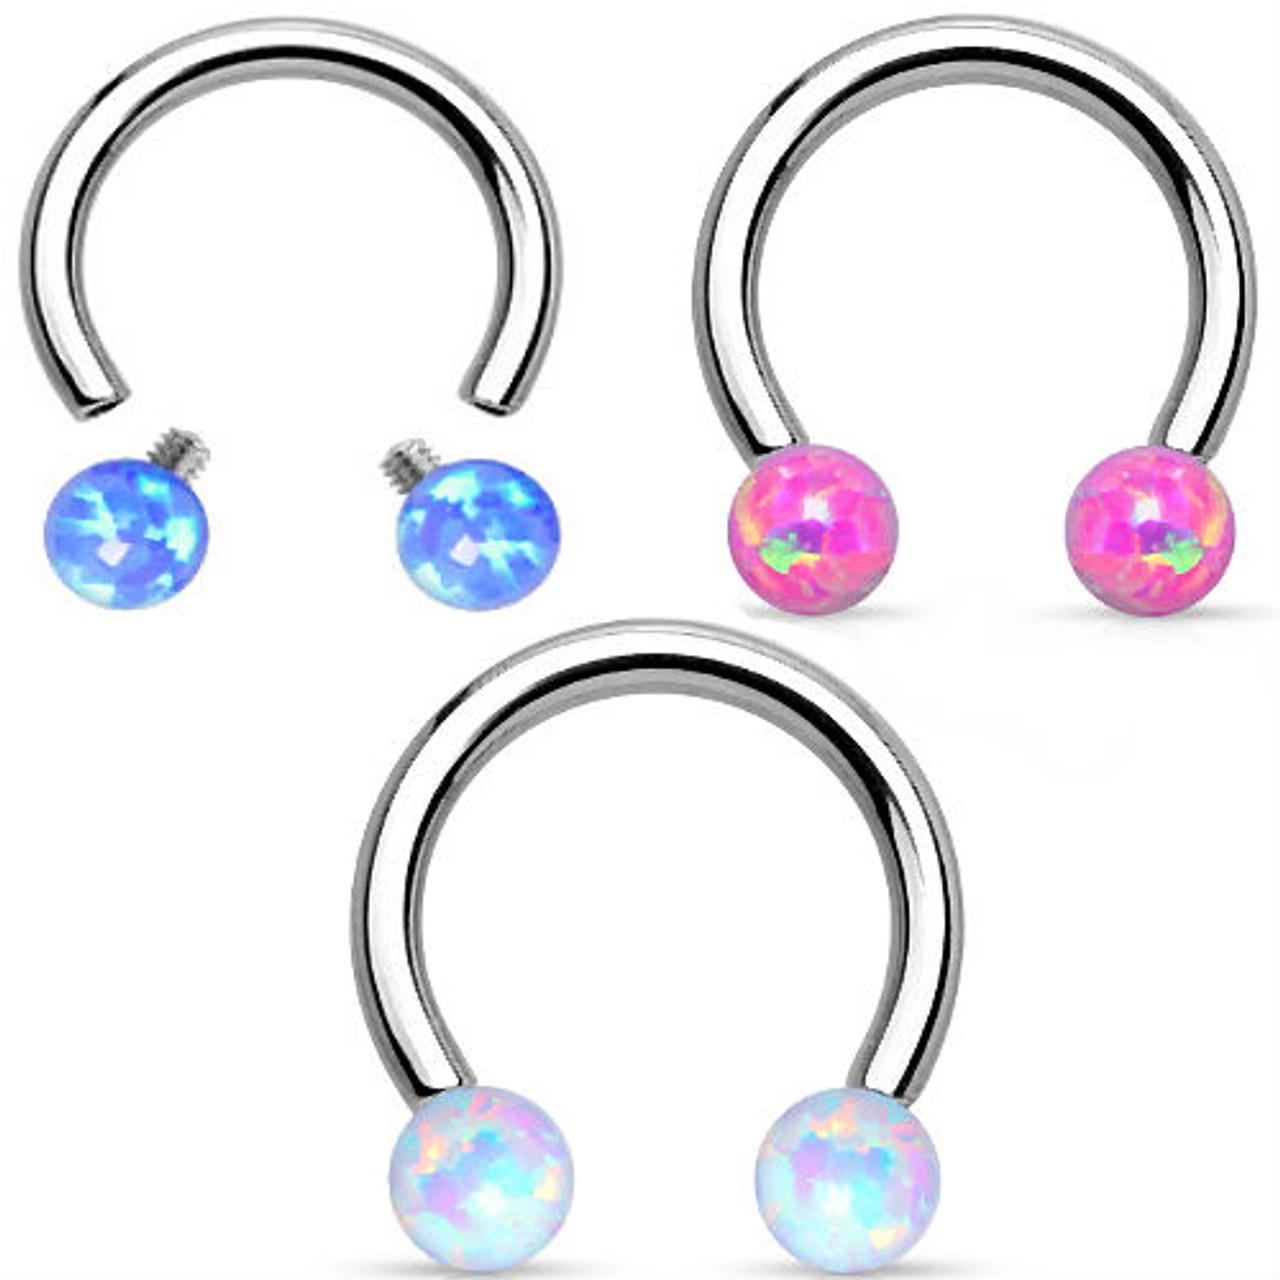 SURGICAL STEEL HORSESHOE Circular Barbell LARGE GAUGE Septum Ear Nipple Ring